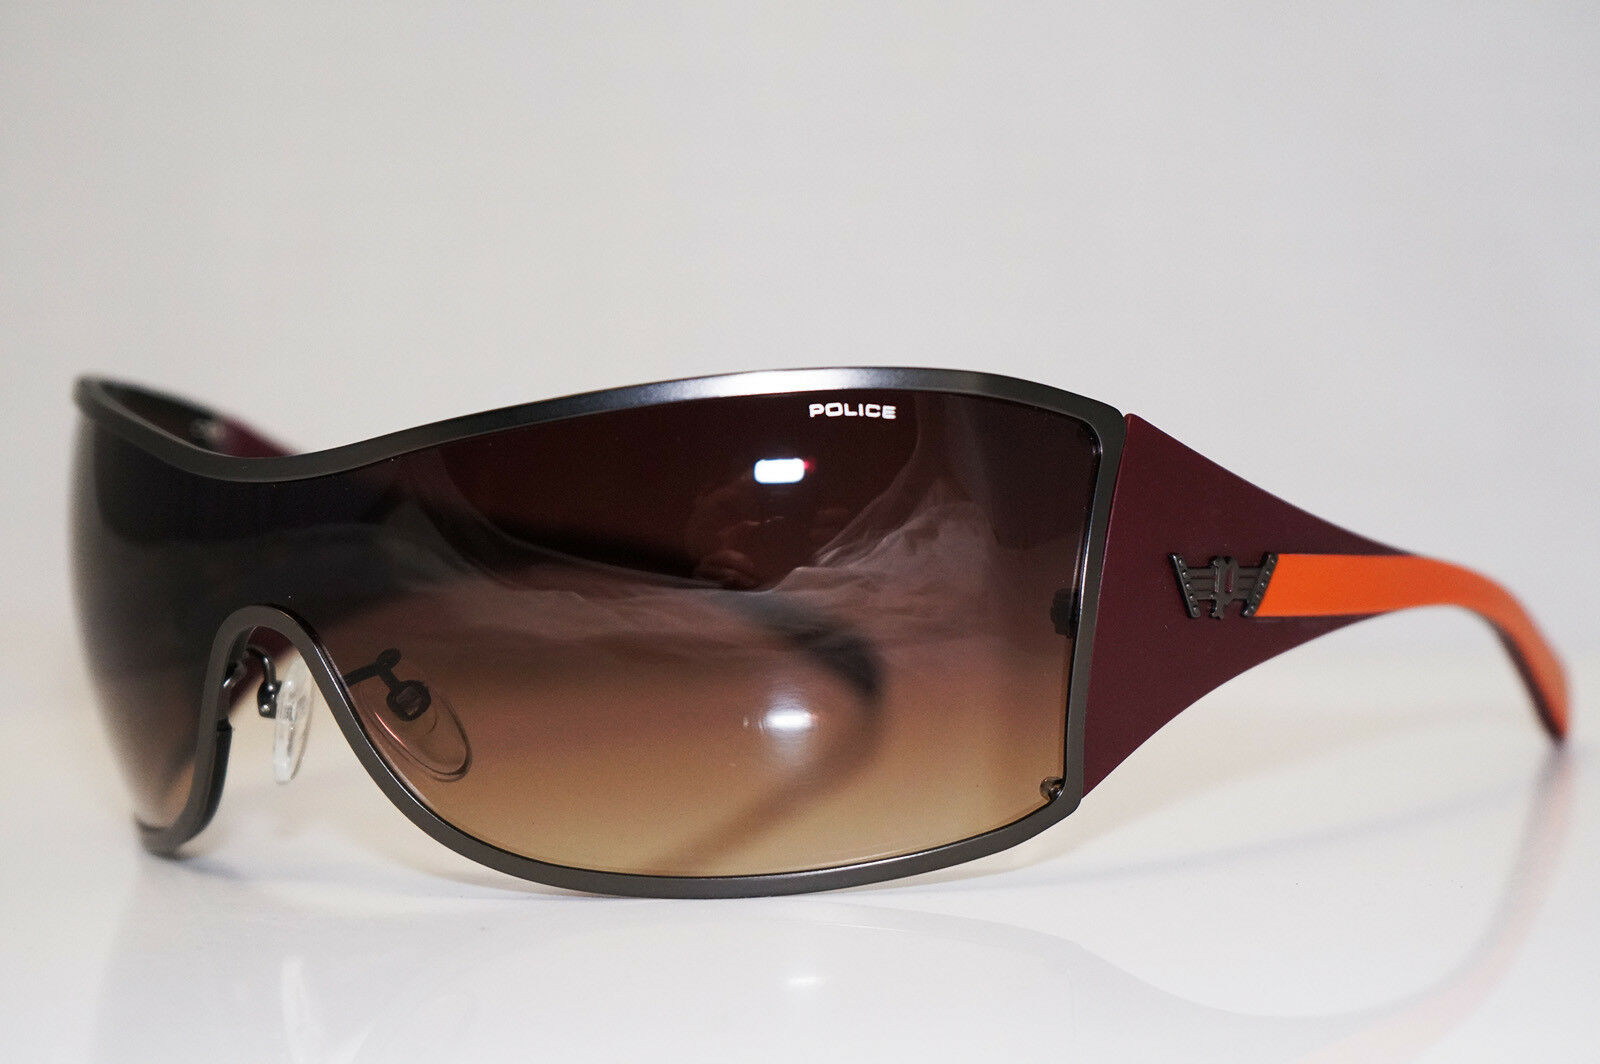 POLICE Mens Designer Sunglasses Gunmetal Shield S8827 COL 0H68 13397